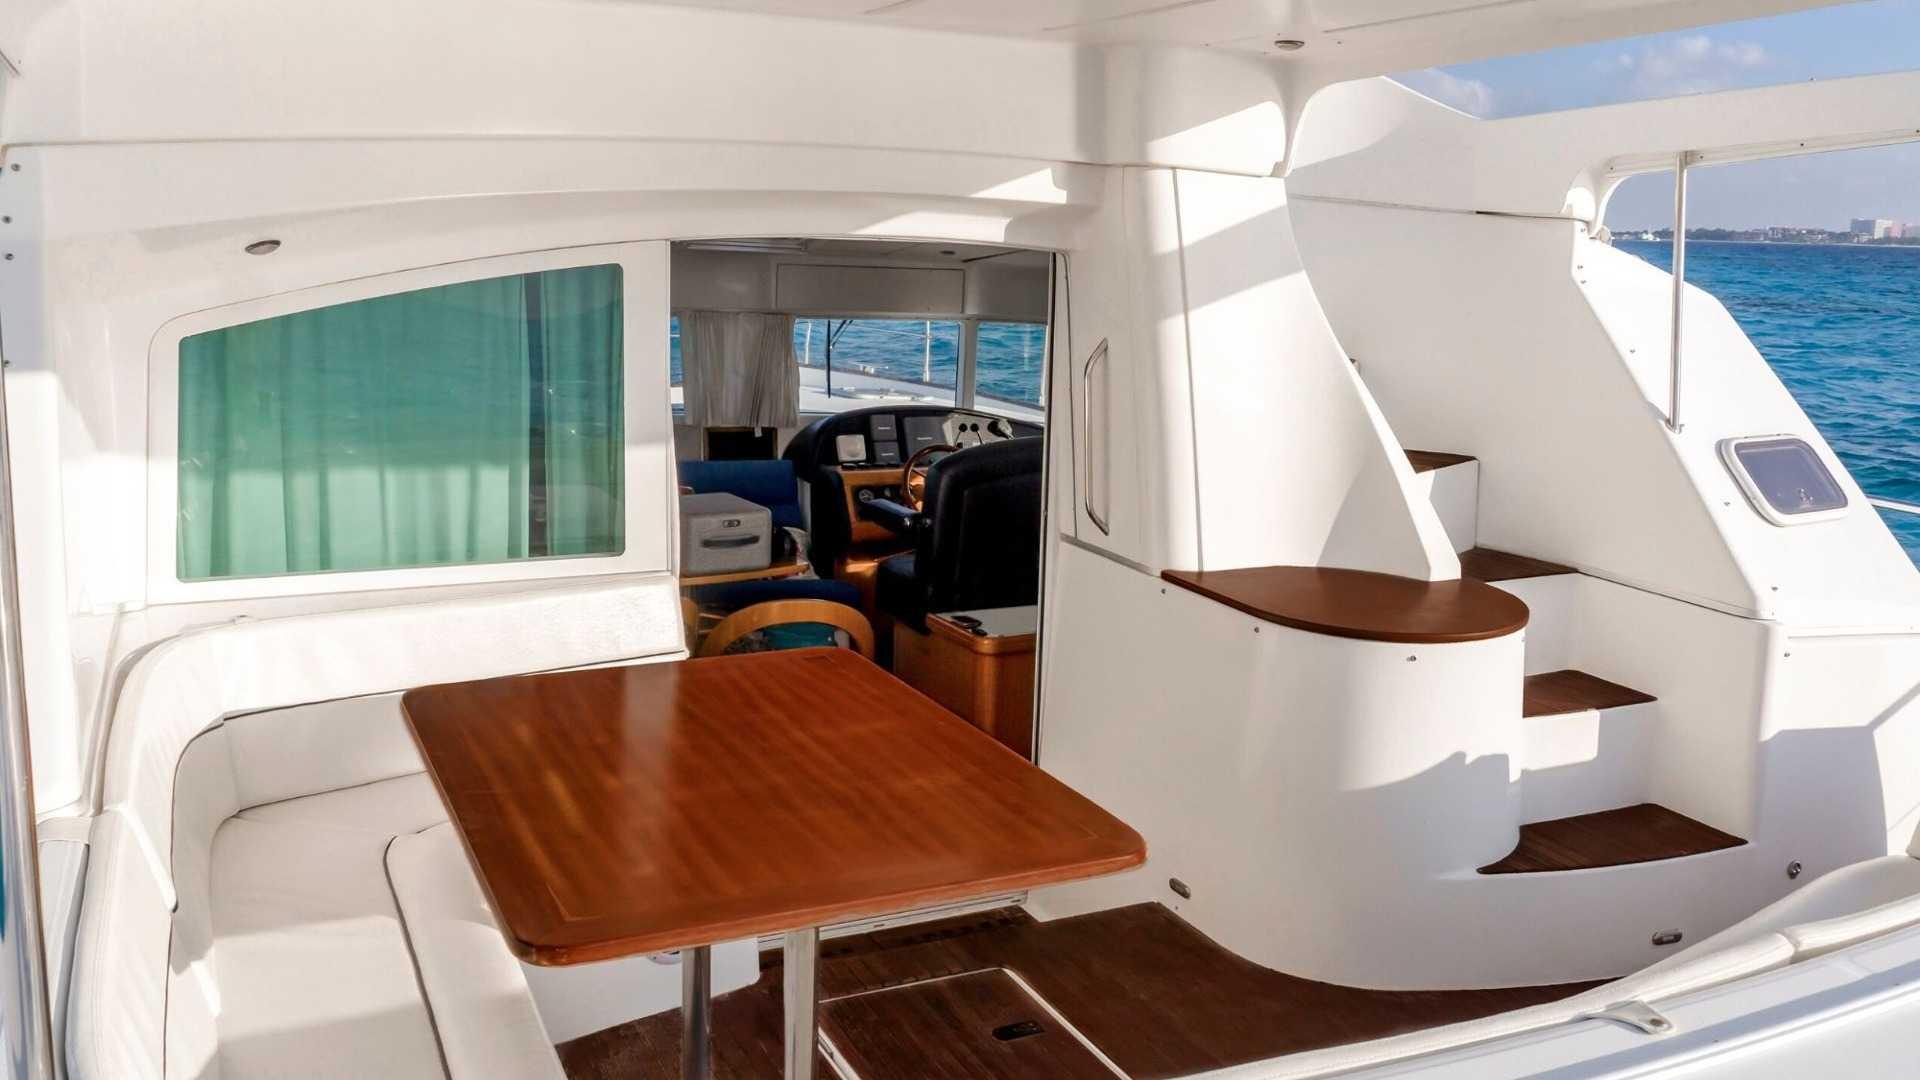 2 - LowRes - Private Isla Mujeres tour in catamaran - Seabaris - Cancun Sailing